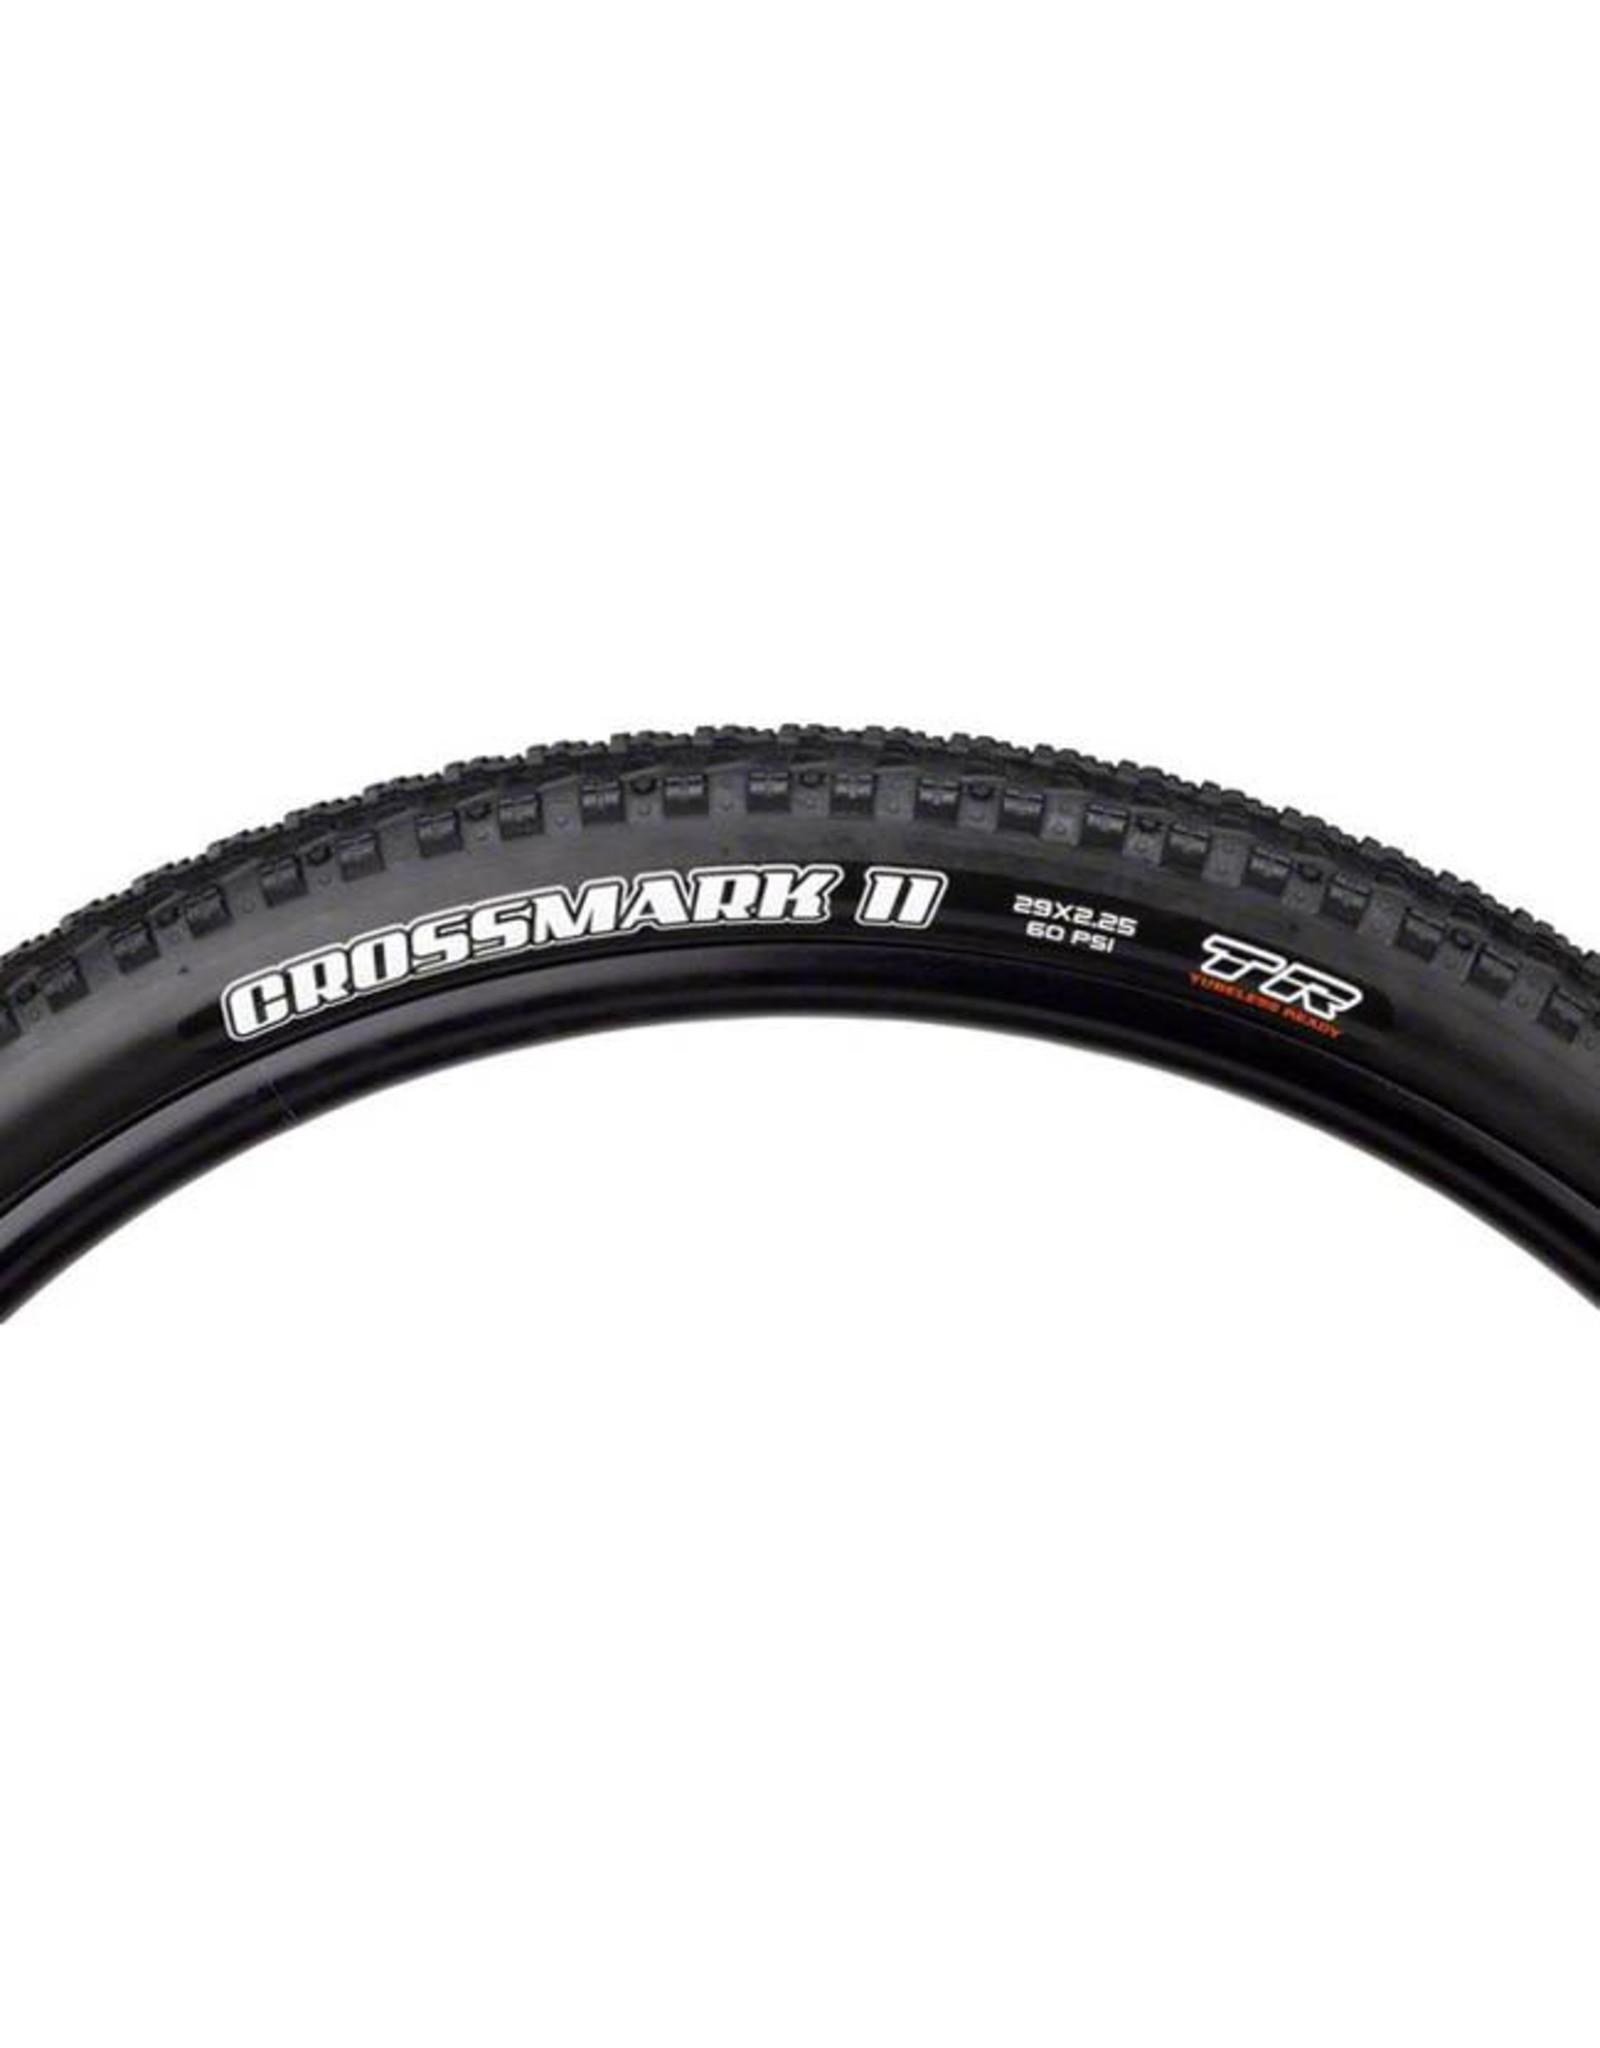 "Maxxis Maxxis Crossmark II Tire: 29 x 2.25"", Folding, 60tpi, Dual Compound, Tubeless Ready, Black"